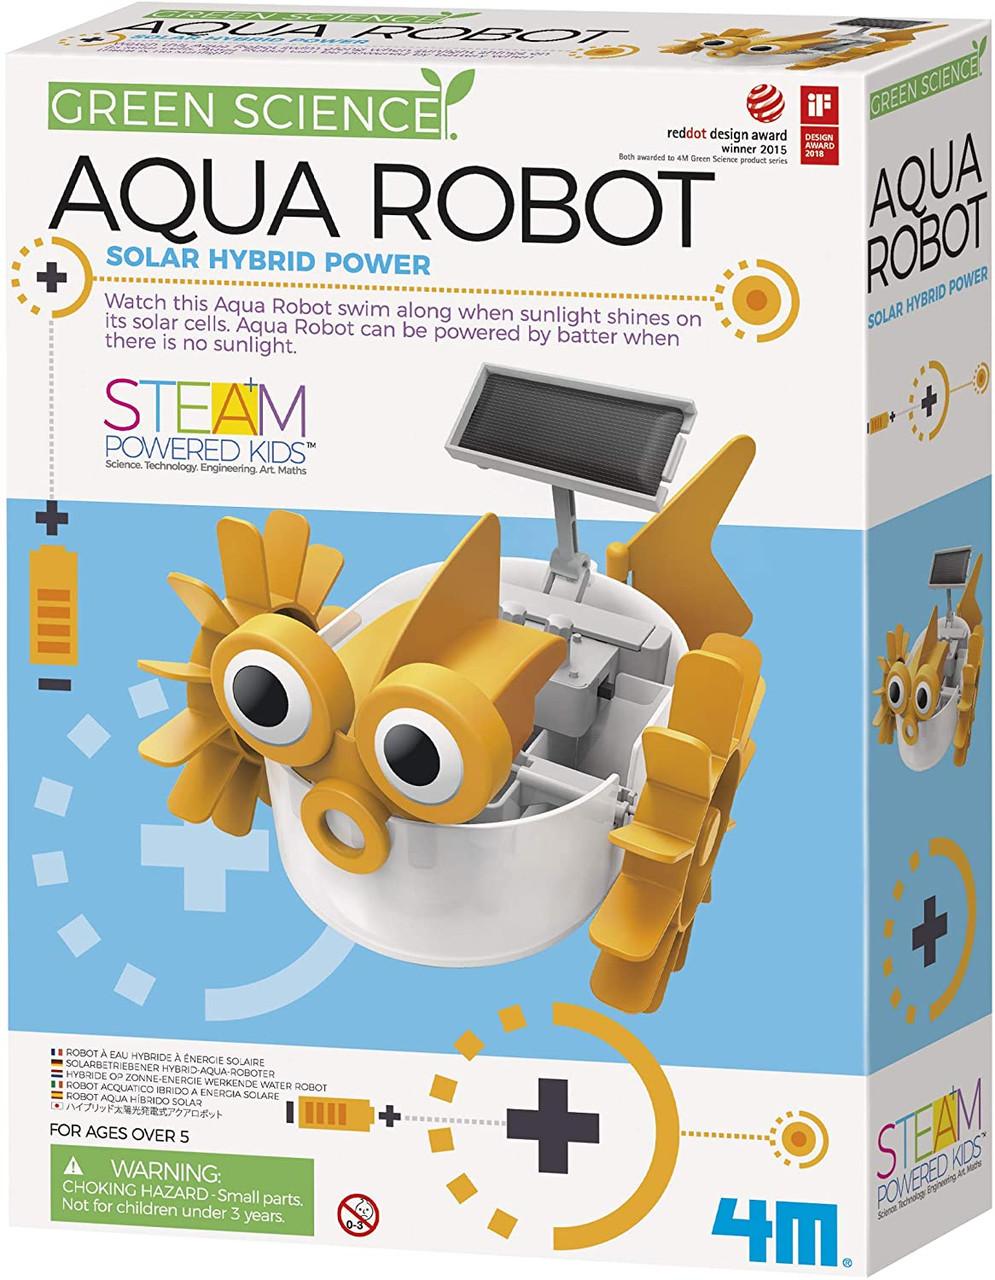 HYBRID SOLAR ENGINEERING AQUA ROBOT